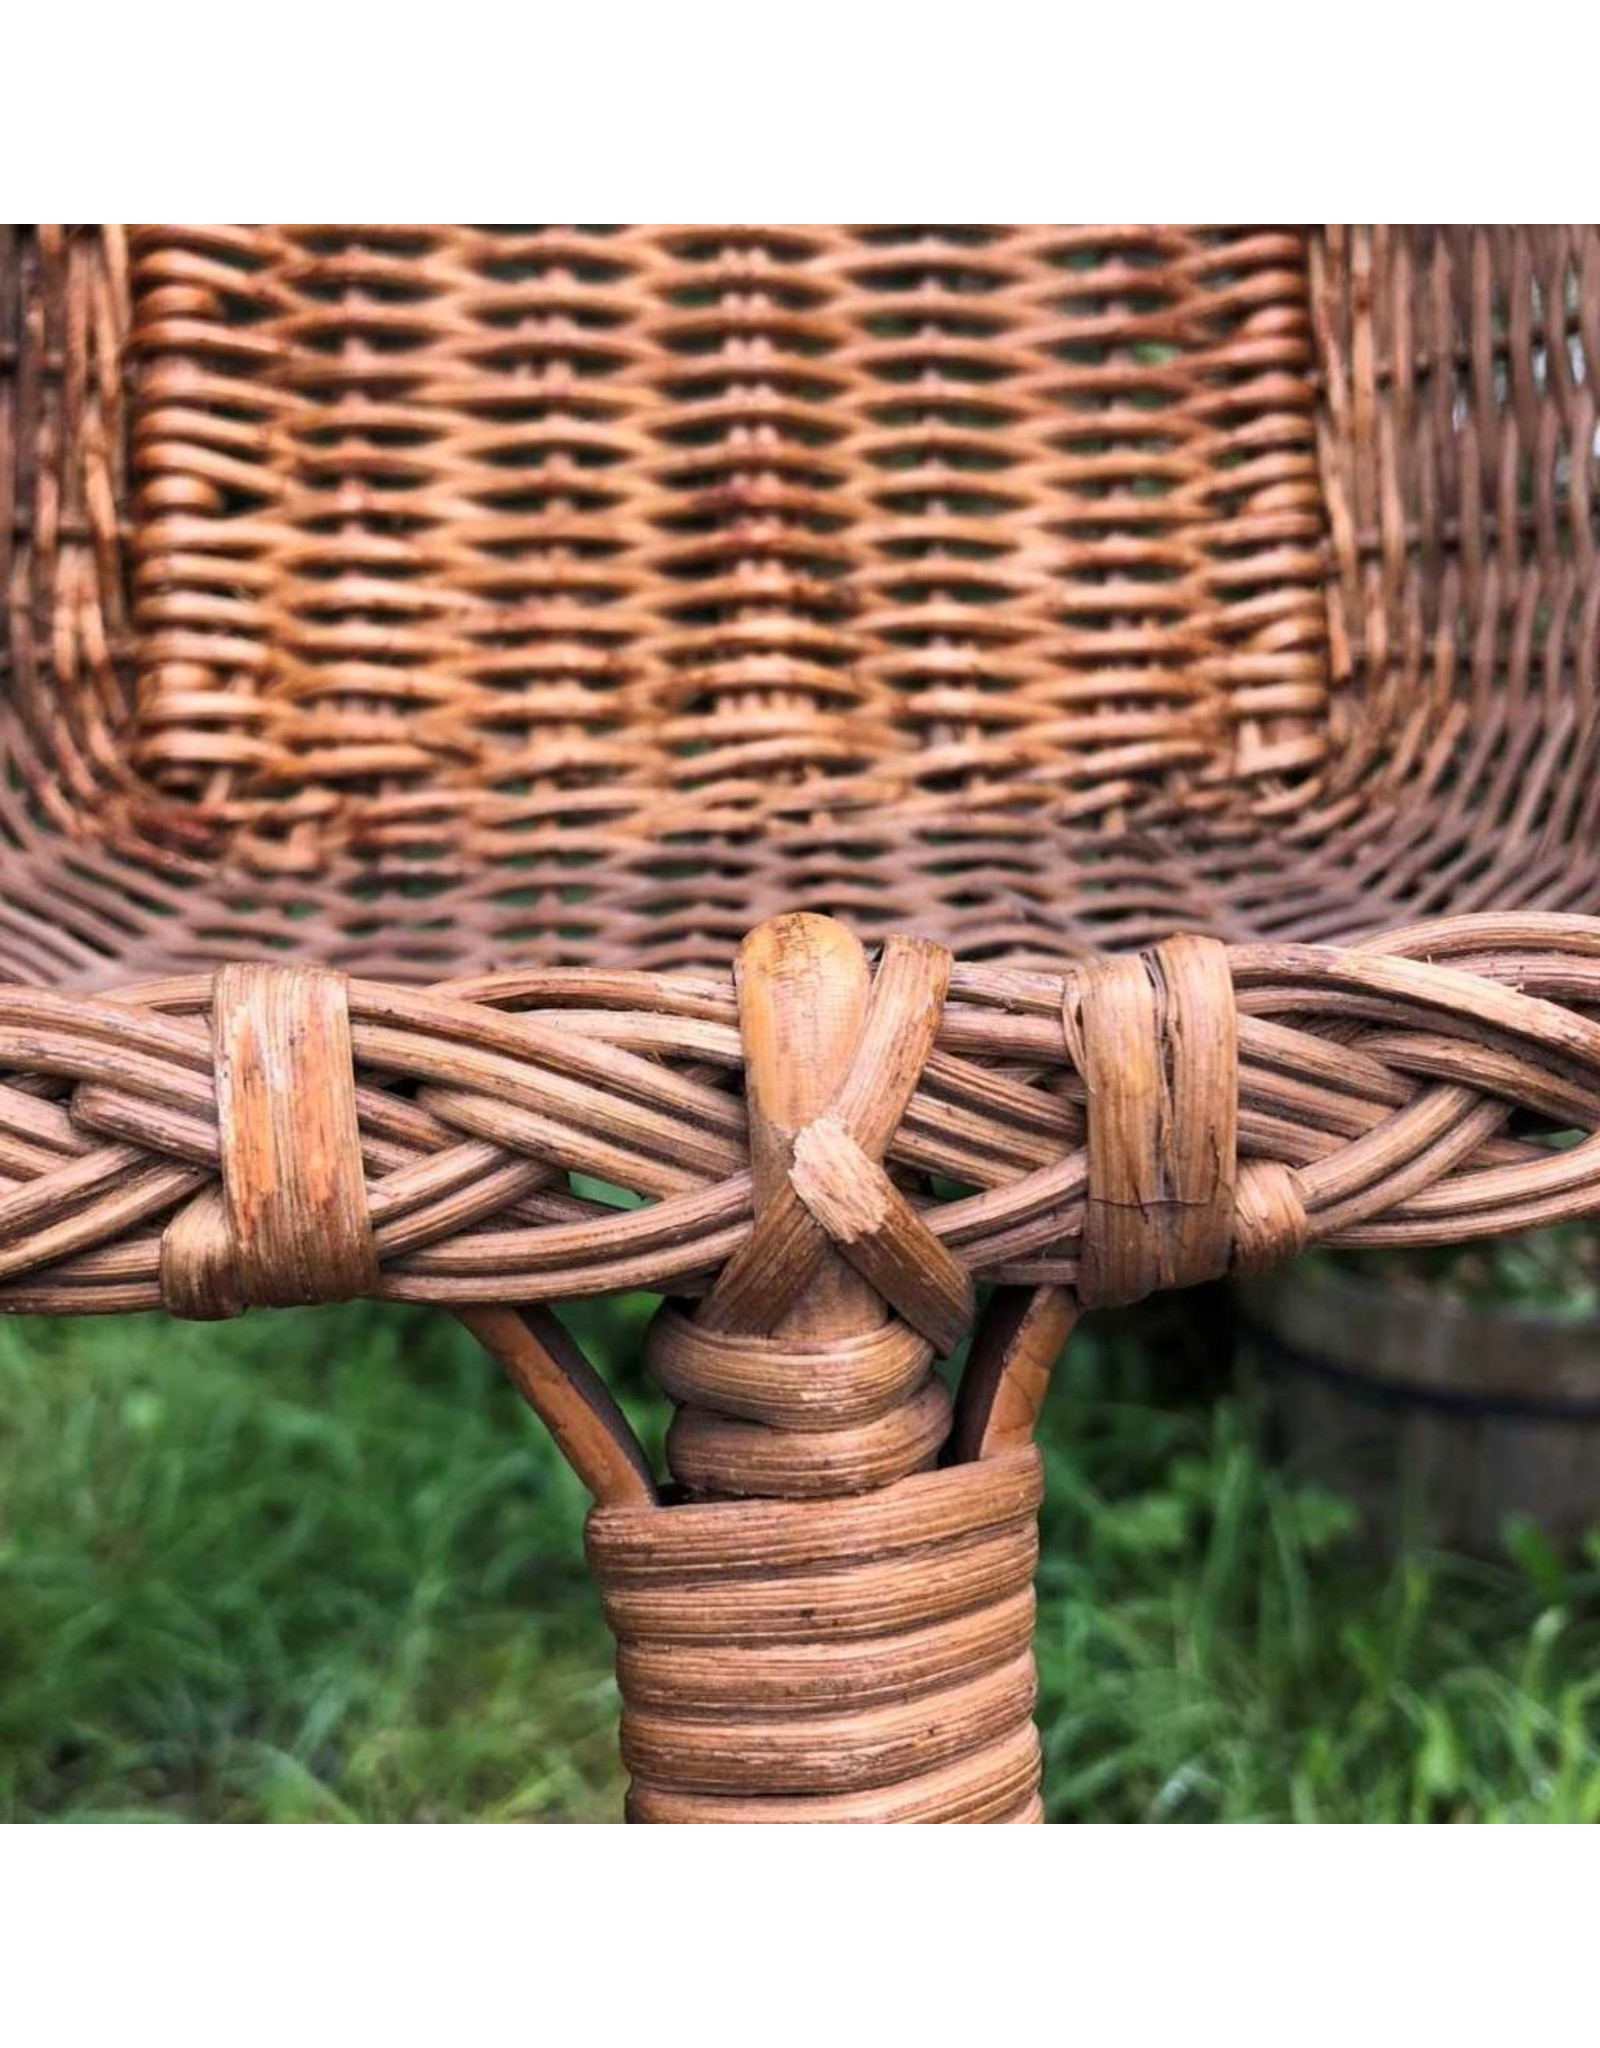 Basket on pole - collections basket